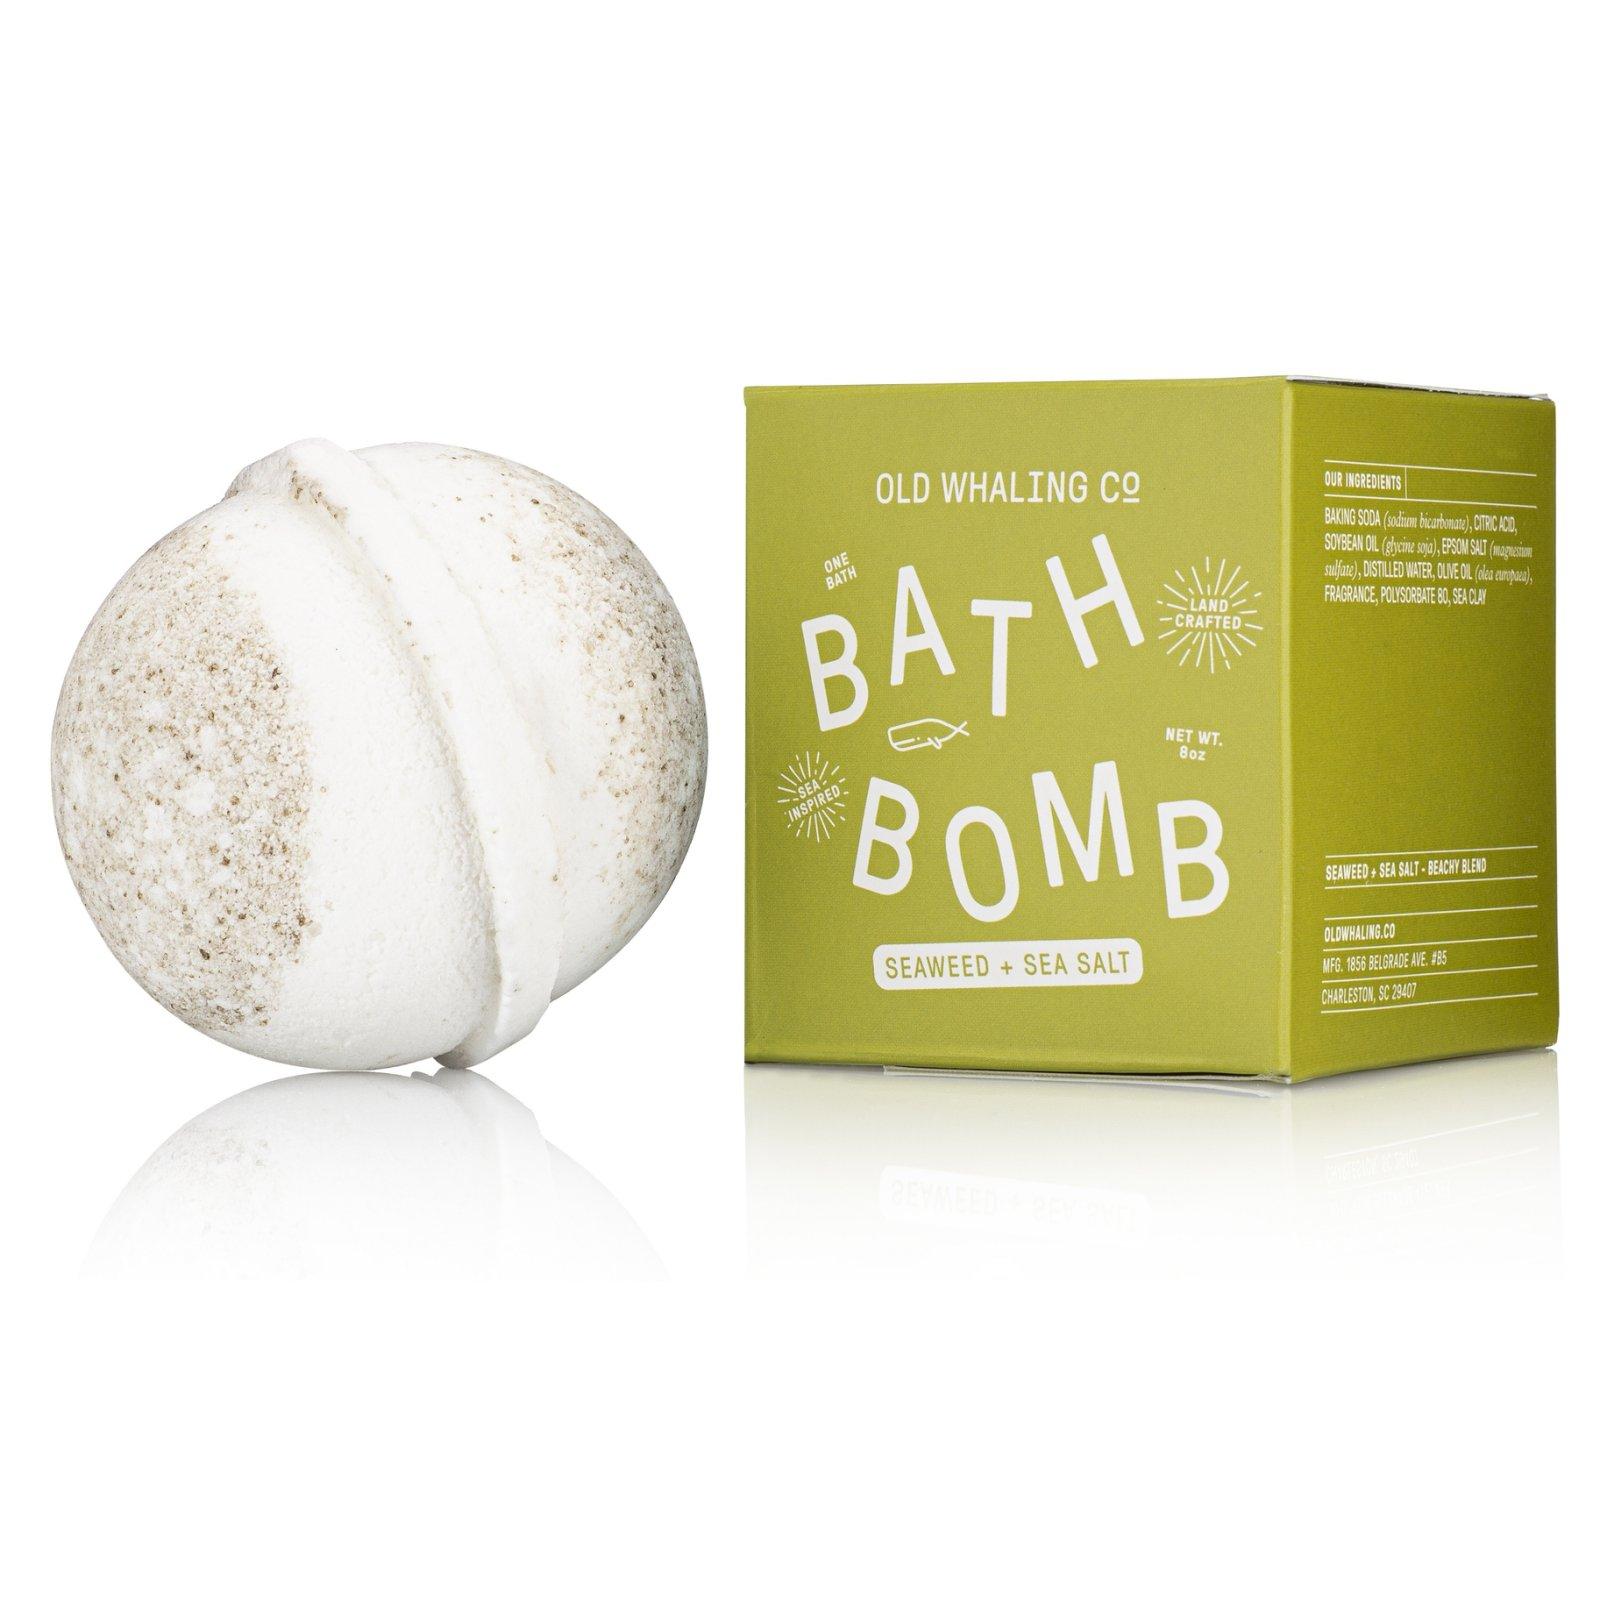 Bath Bomb Seaweed & Seasalt 8 OZ